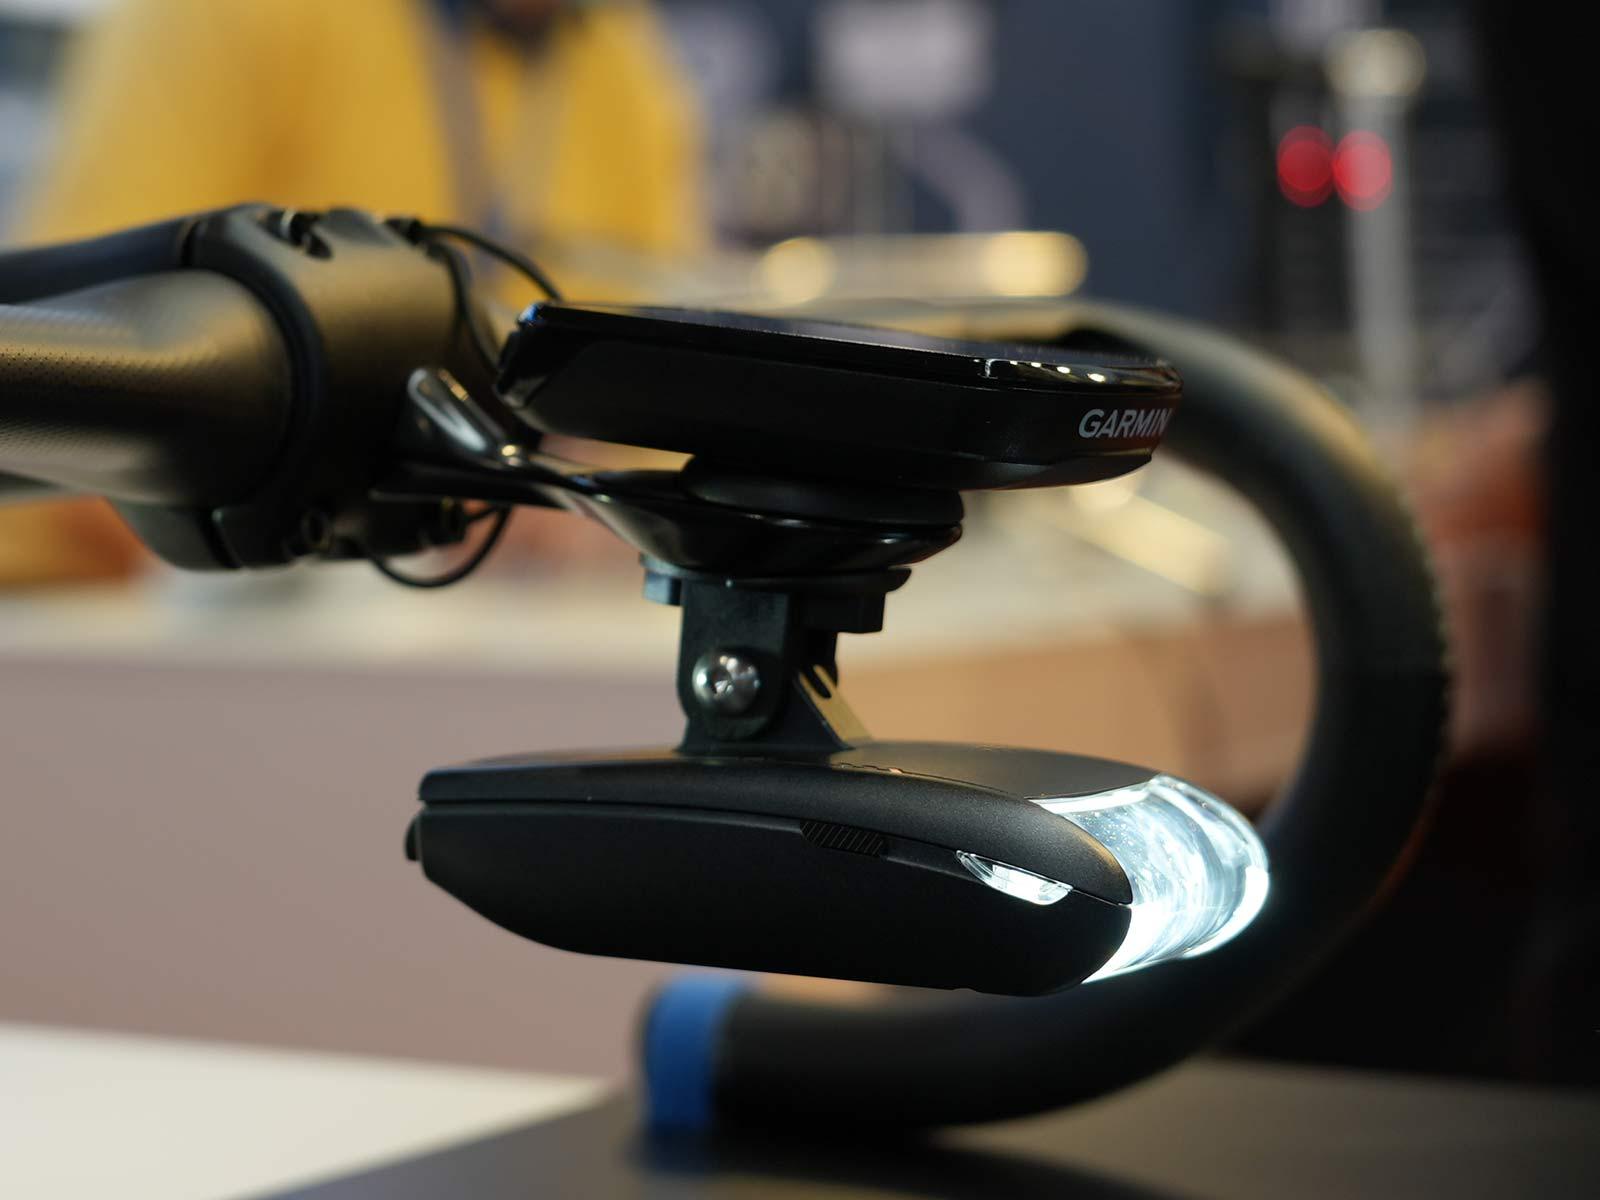 lightskin naca profile aerodynamic road bike headlight with gps cycling computer installed above it